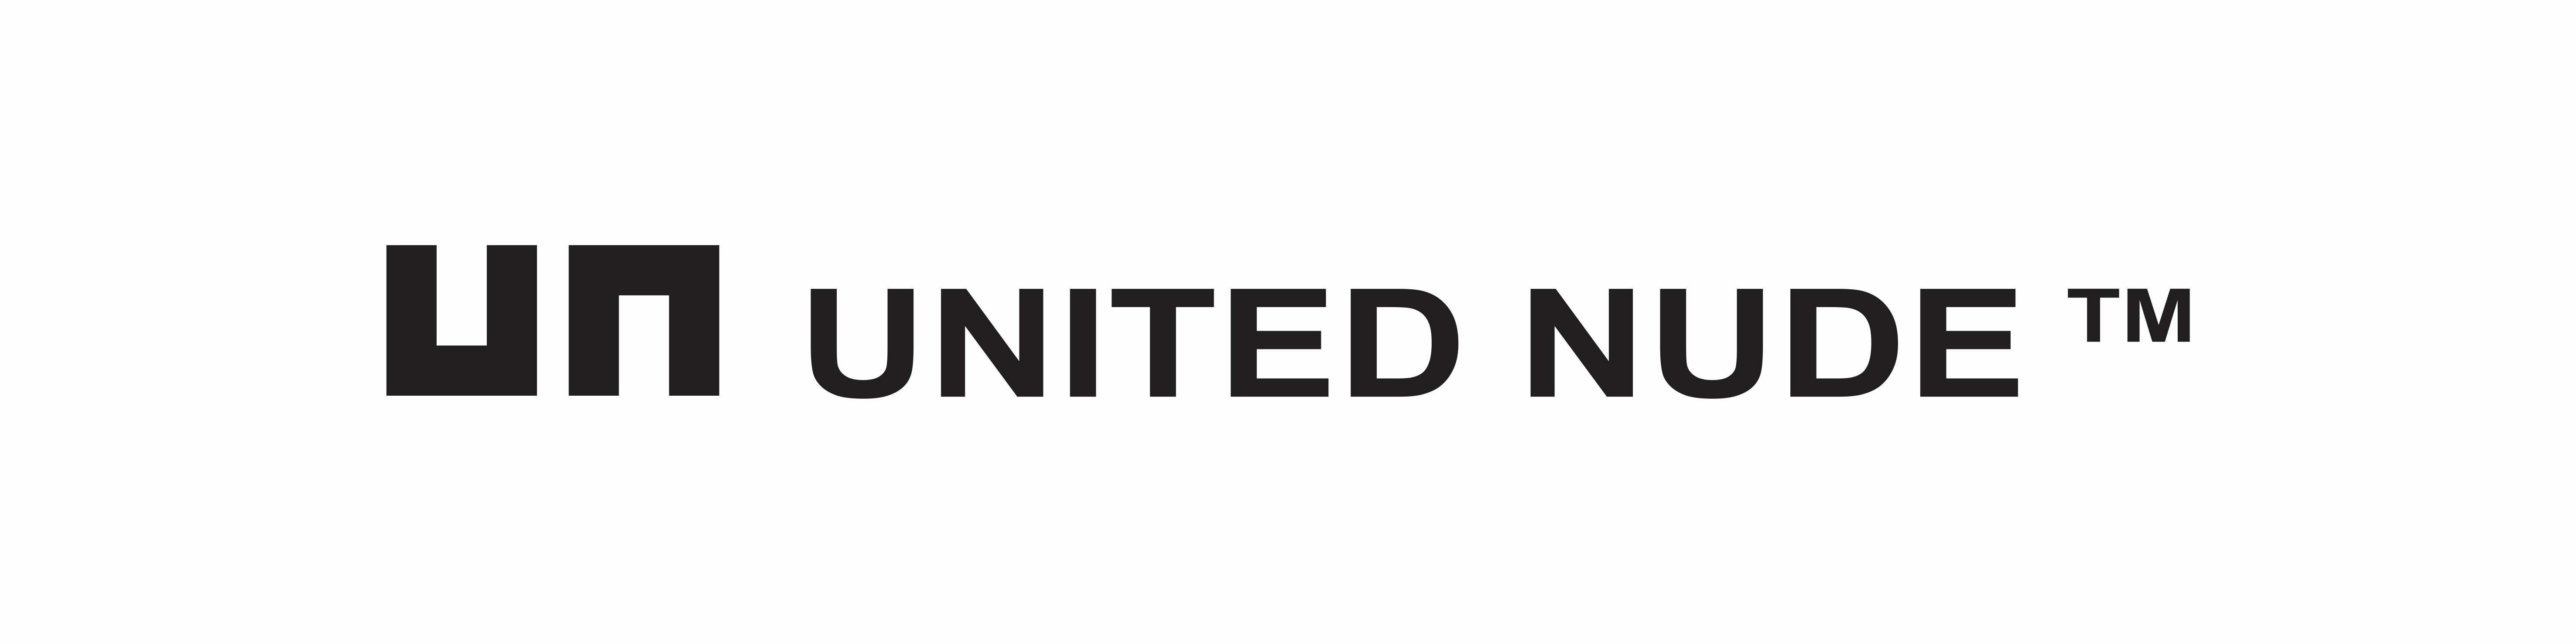 UNITED NUDE TOKYO 移転オープンのお知らせ